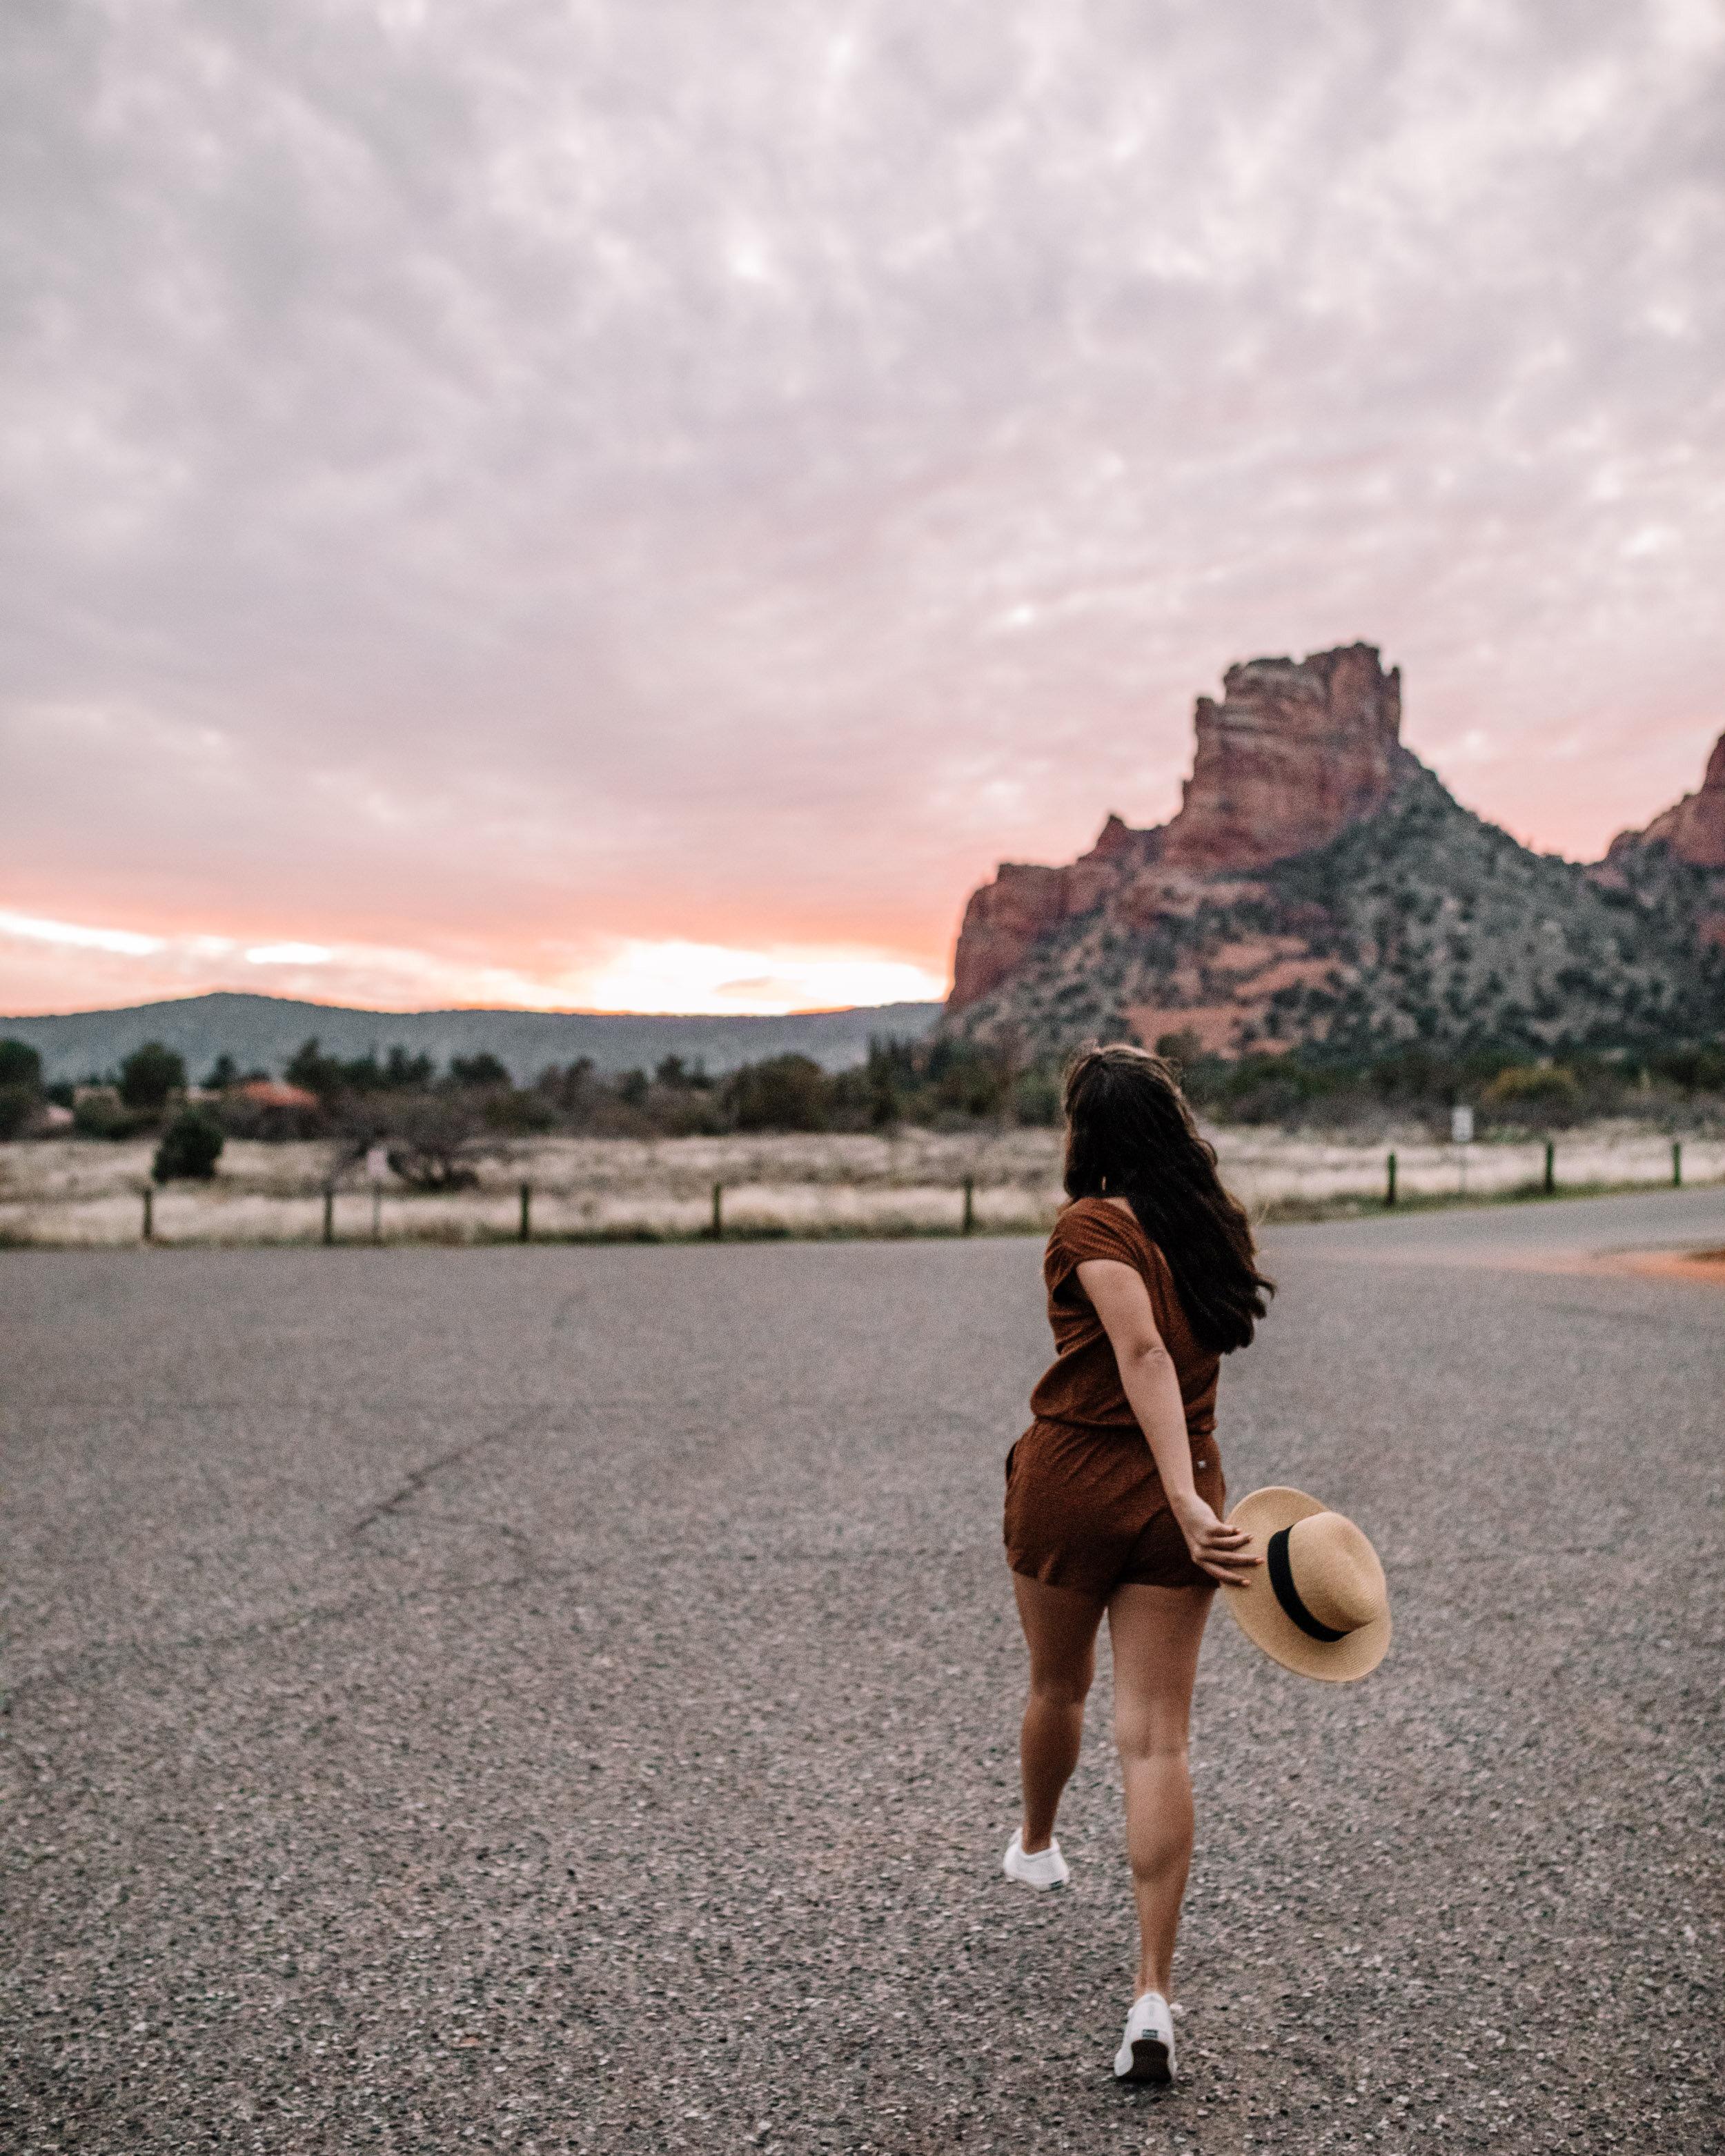 Rachel Off Duty: Woman Skipping on the Road in Sedona, Arizona